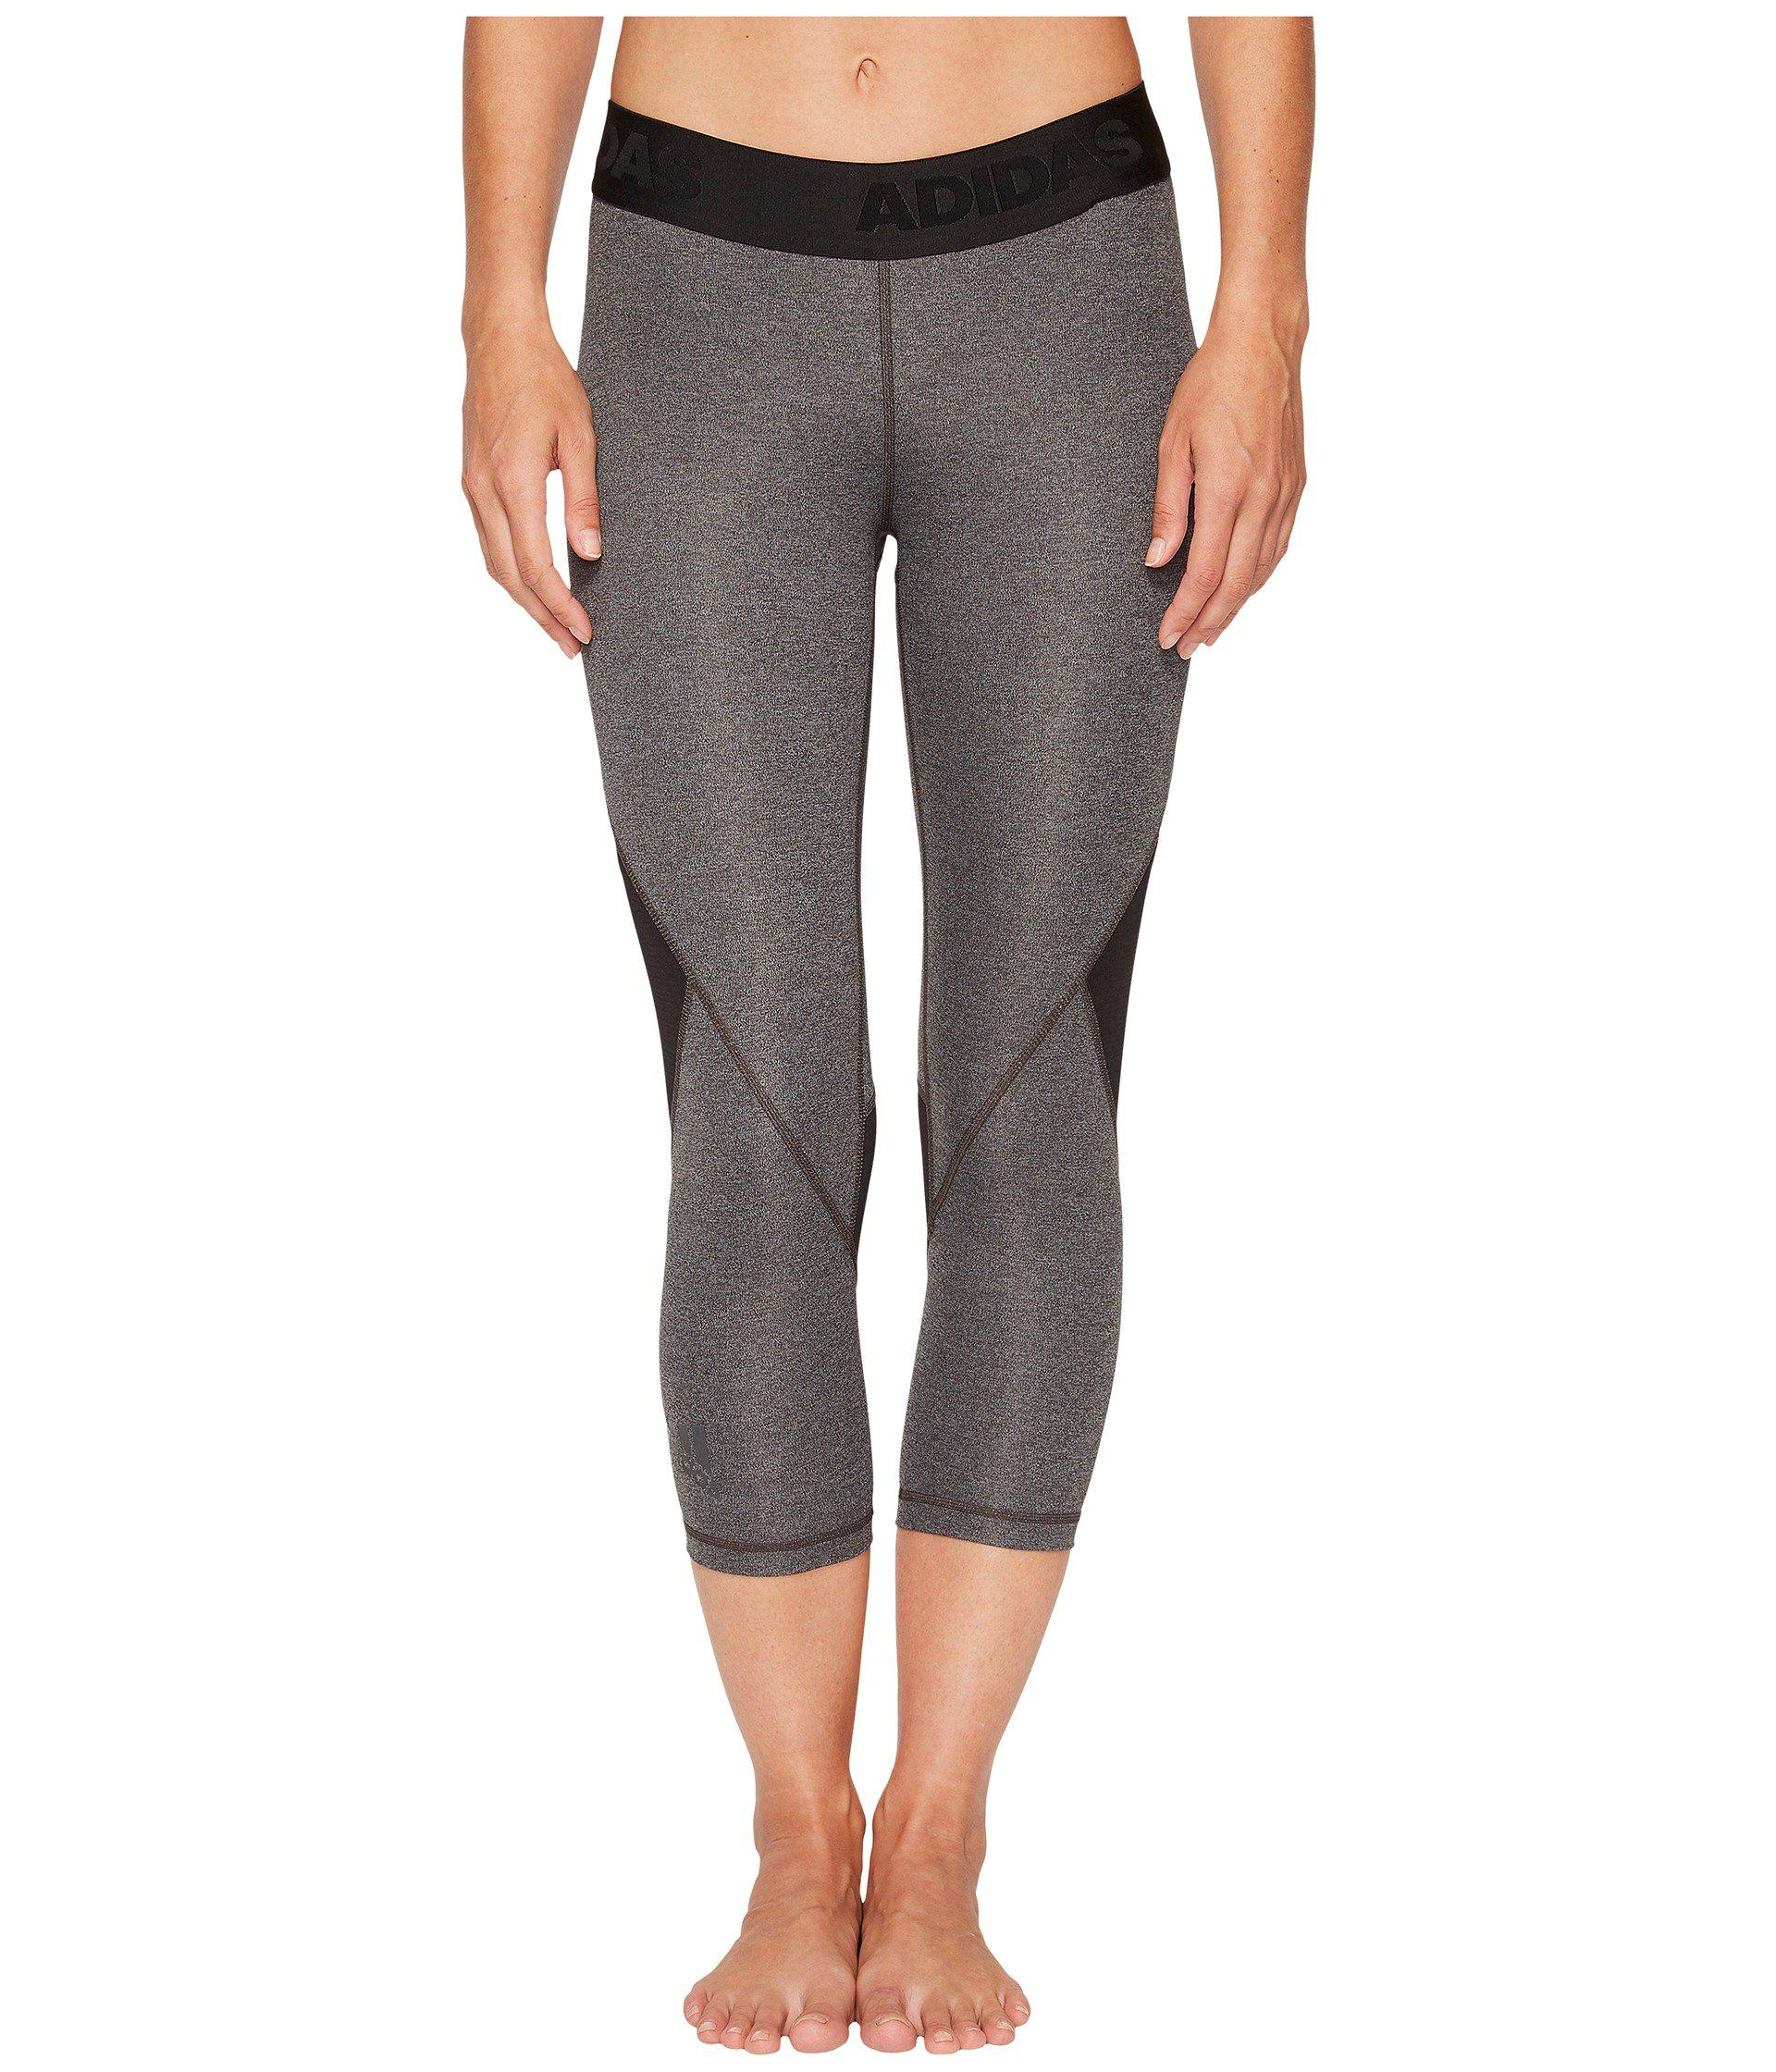 Adidas - Gray Alphaskin Sport 3 4 Tights (black) Women s Workout - Lyst.  View fullscreen a716f5f2e82